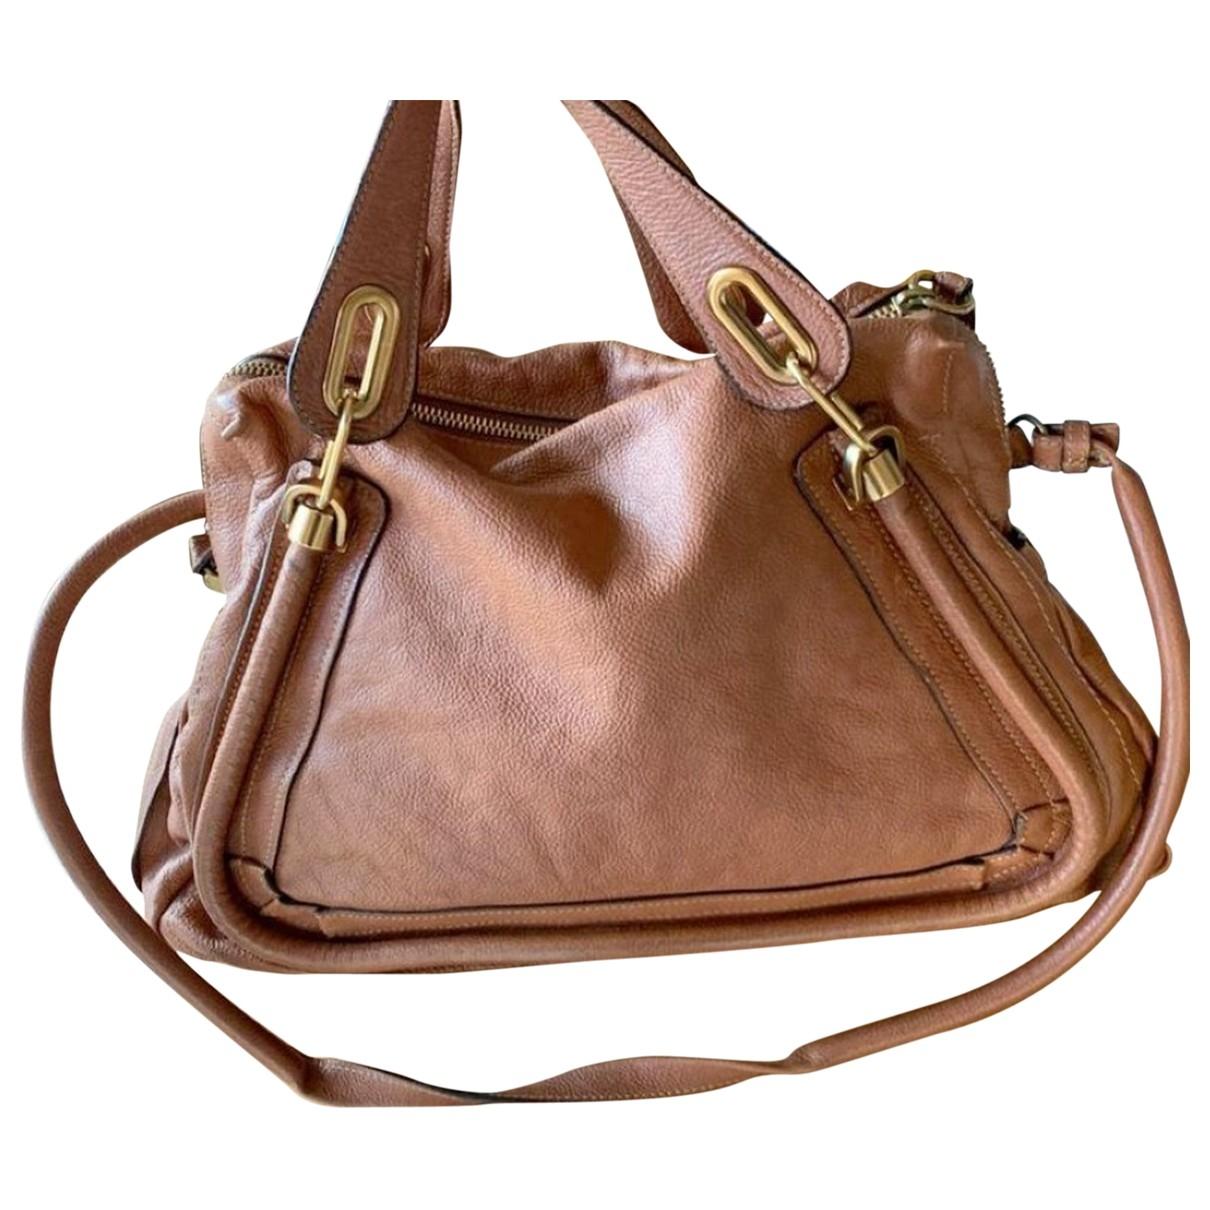 Chloé Paraty Camel Leather handbag for Women \N